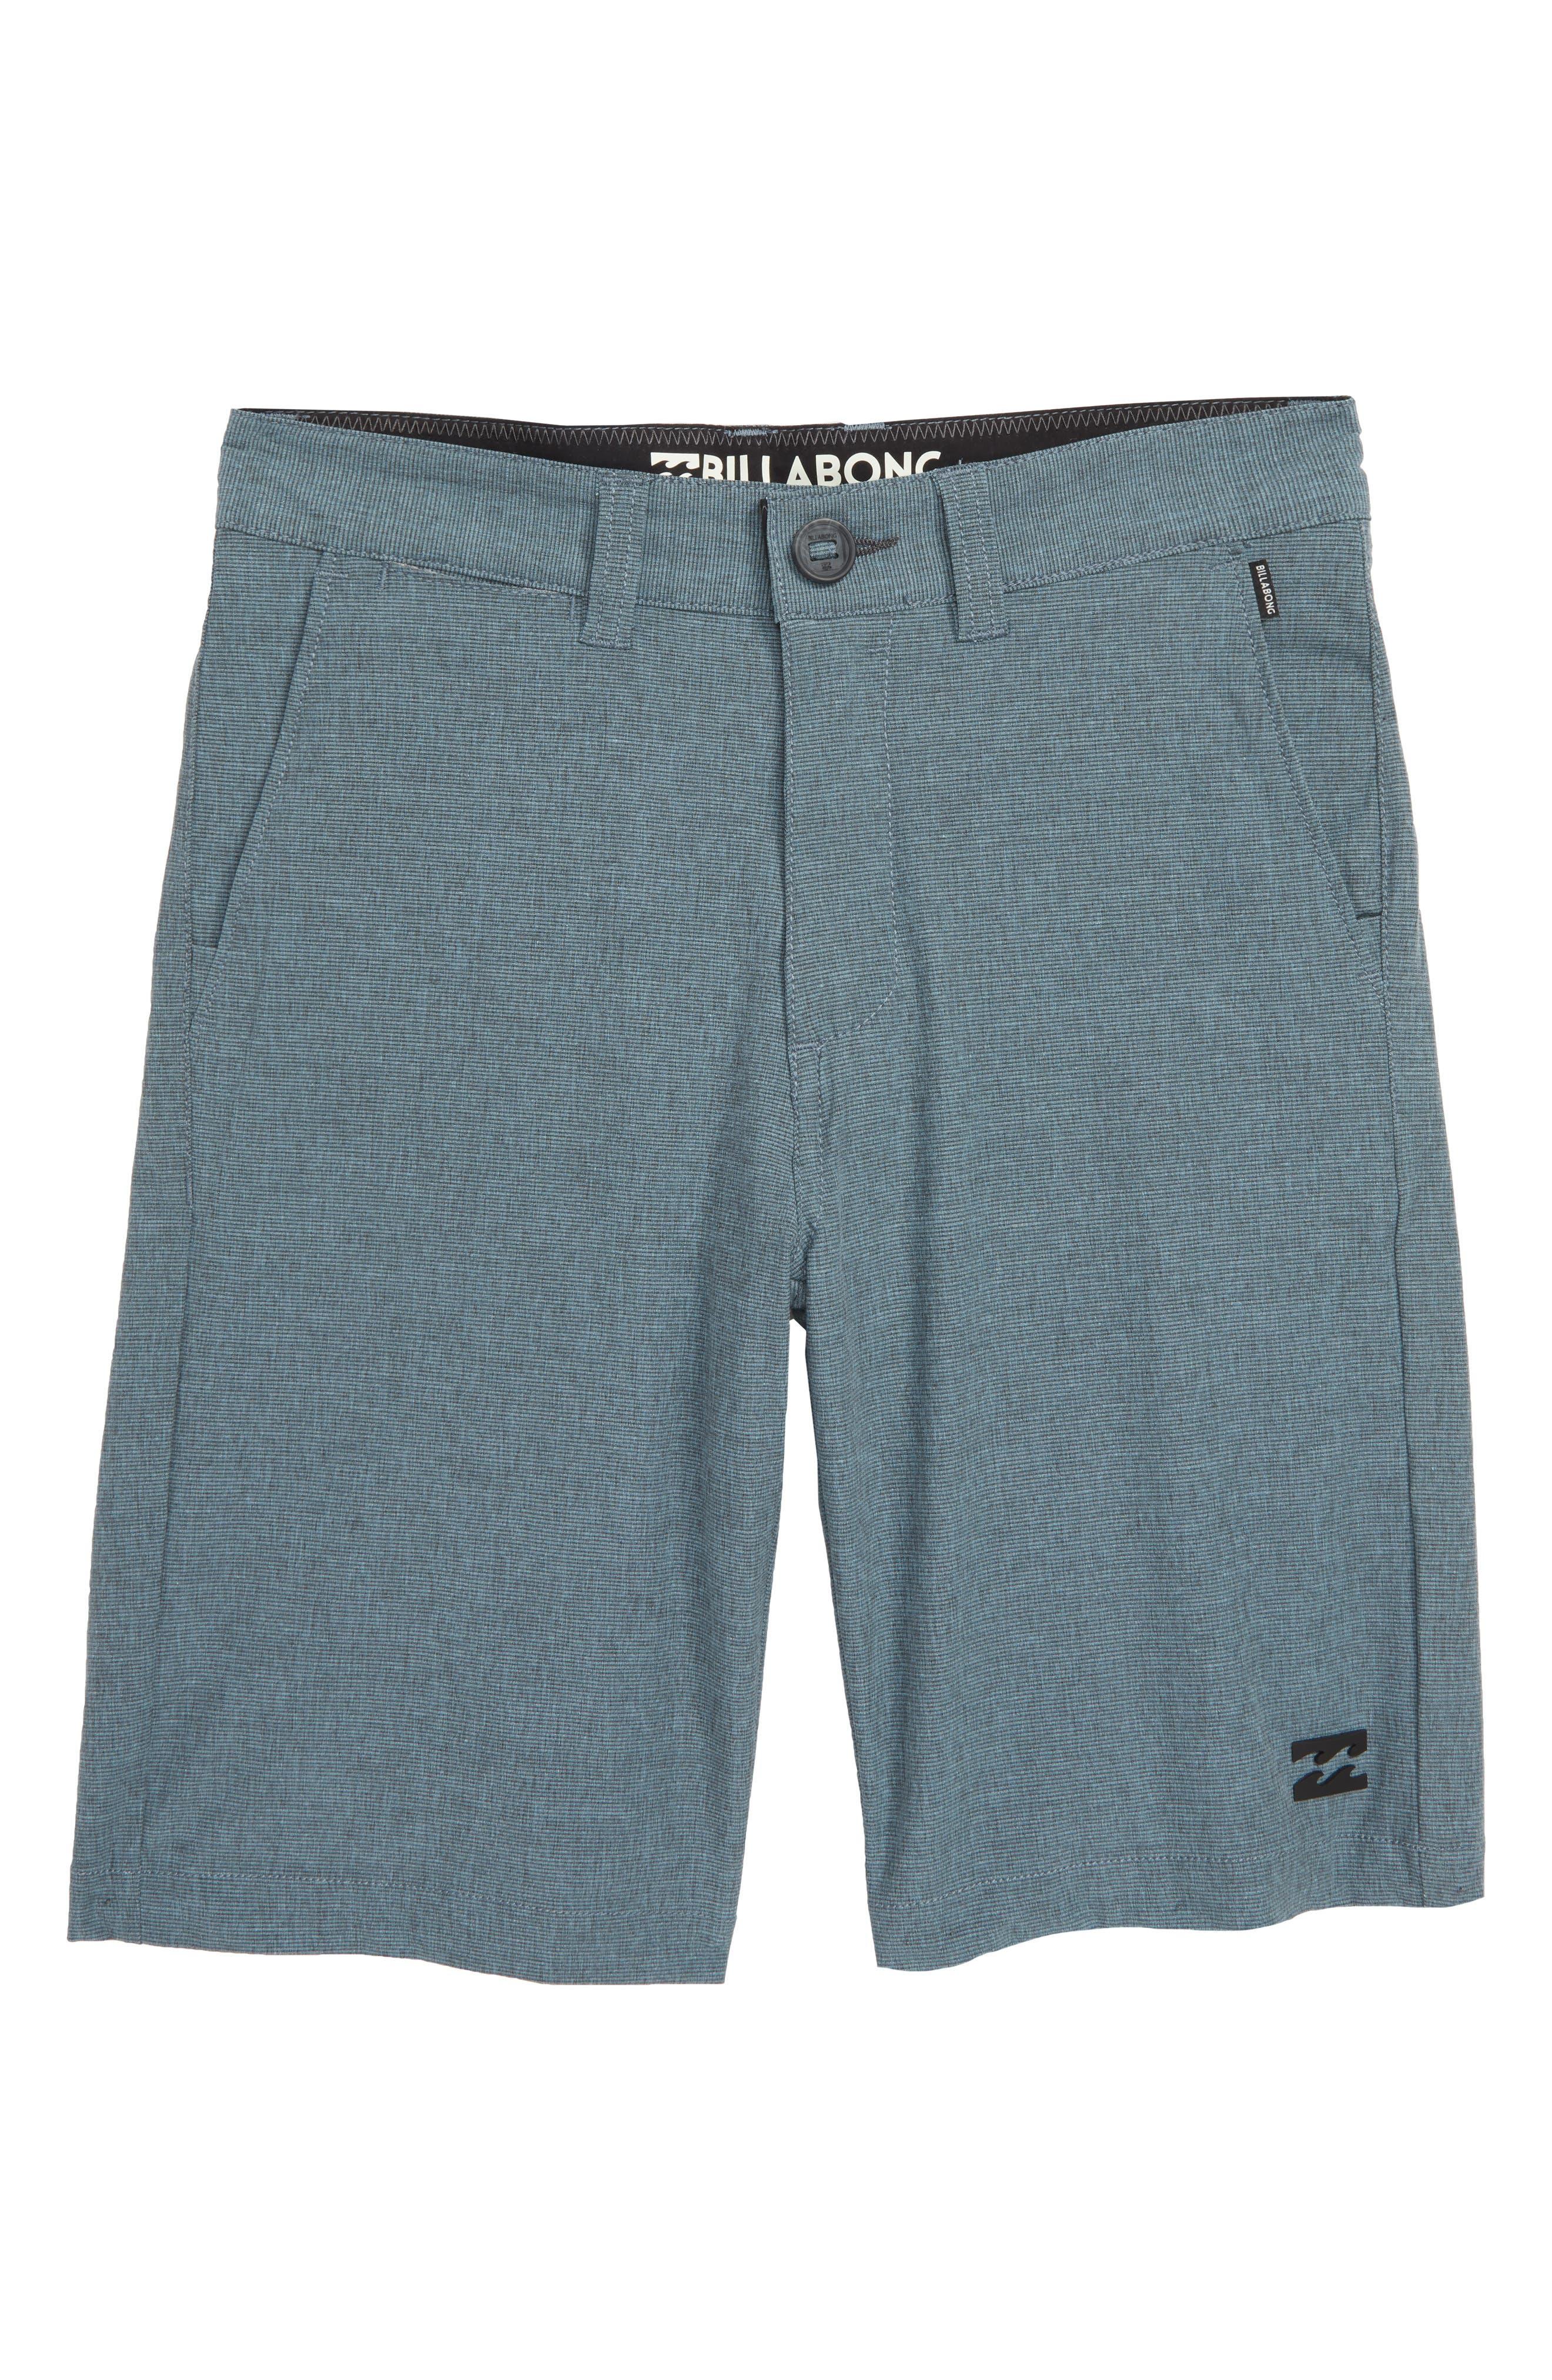 Crossfire X Hybrid Shorts,                             Main thumbnail 1, color,                             LAGOON